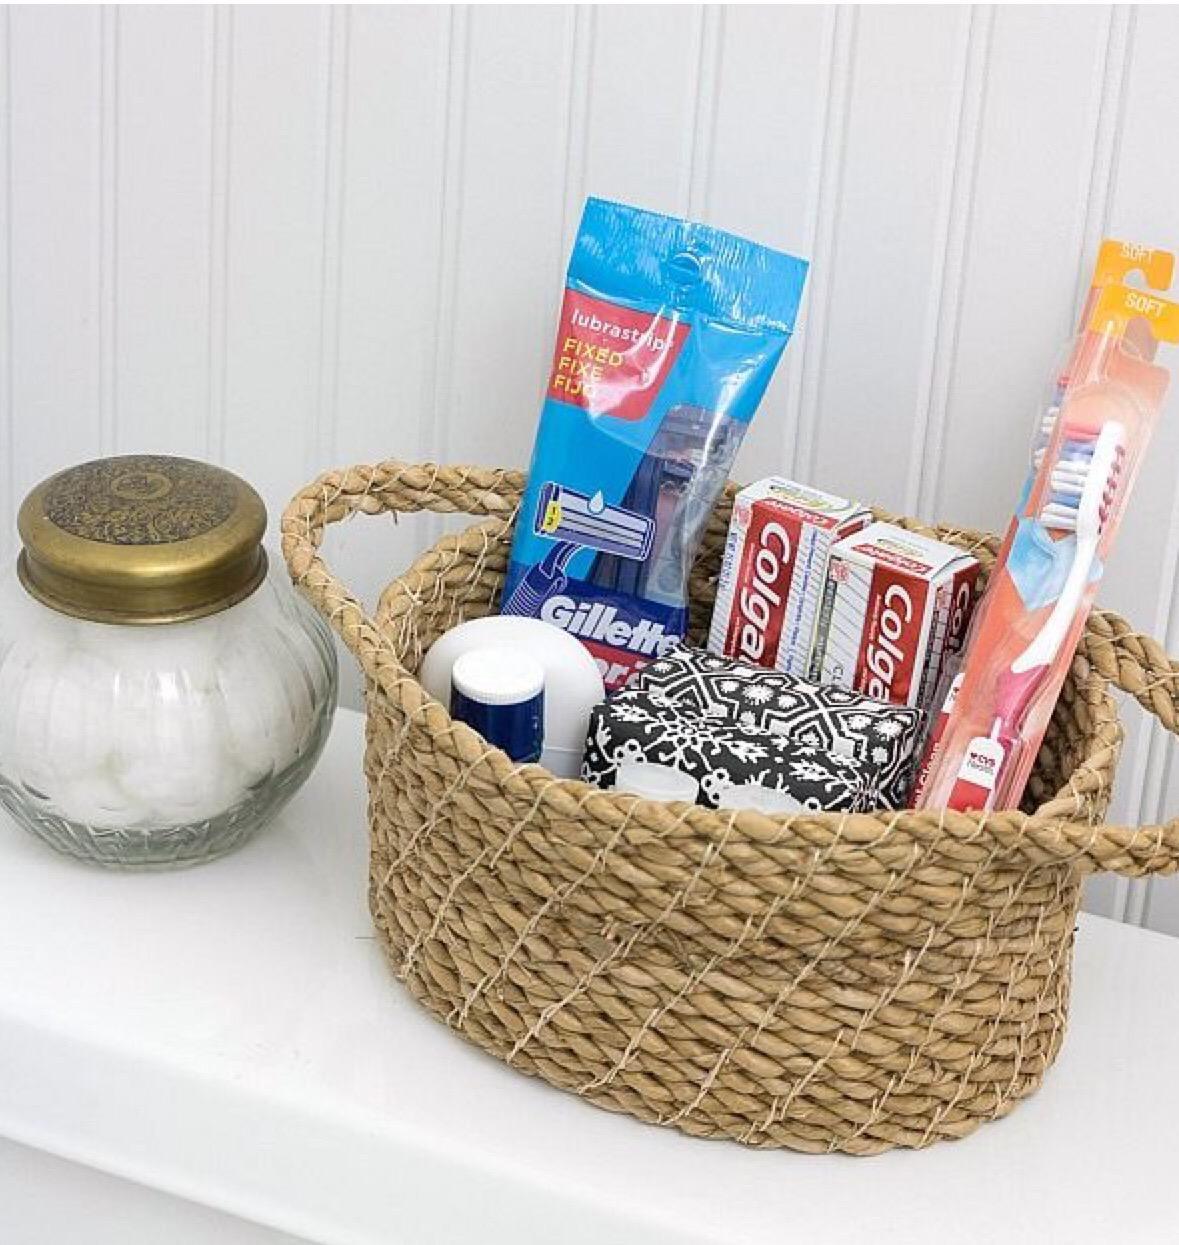 Bath room basics for guest room